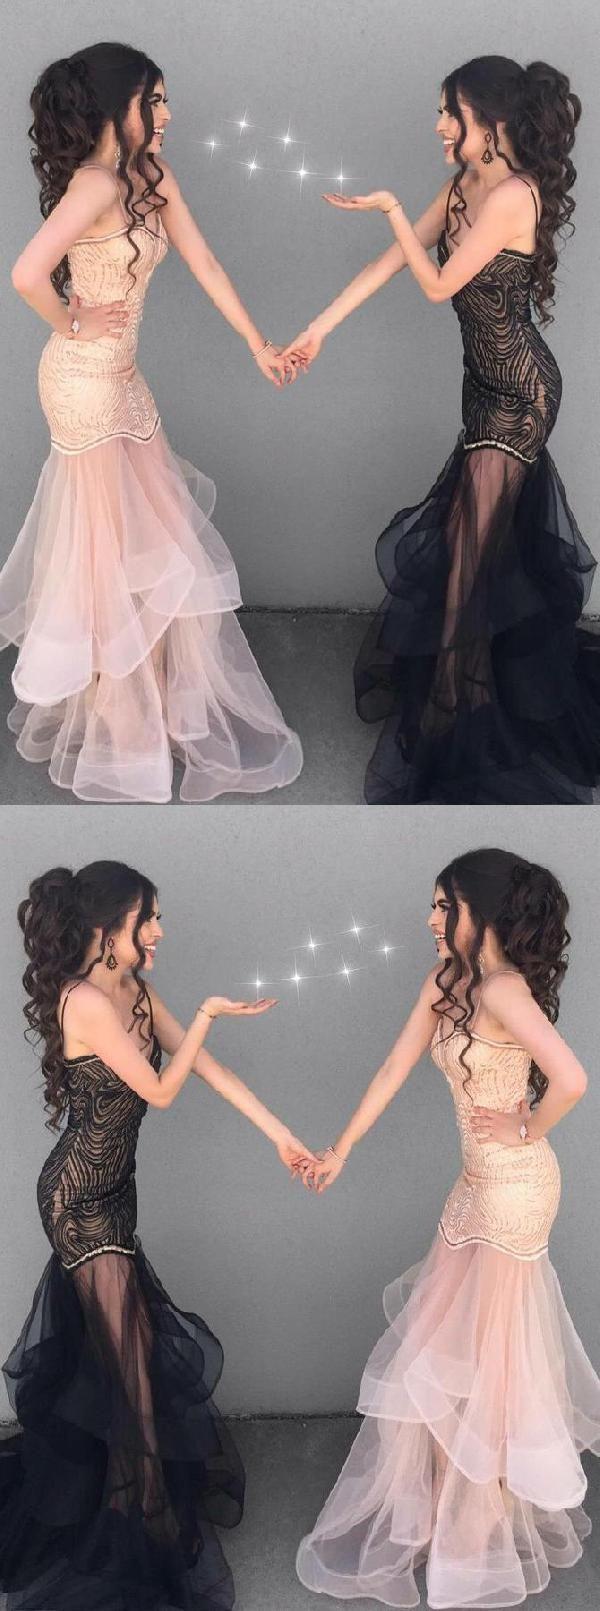 Prom dress mermaid prom dress long black prom dress black mermaid